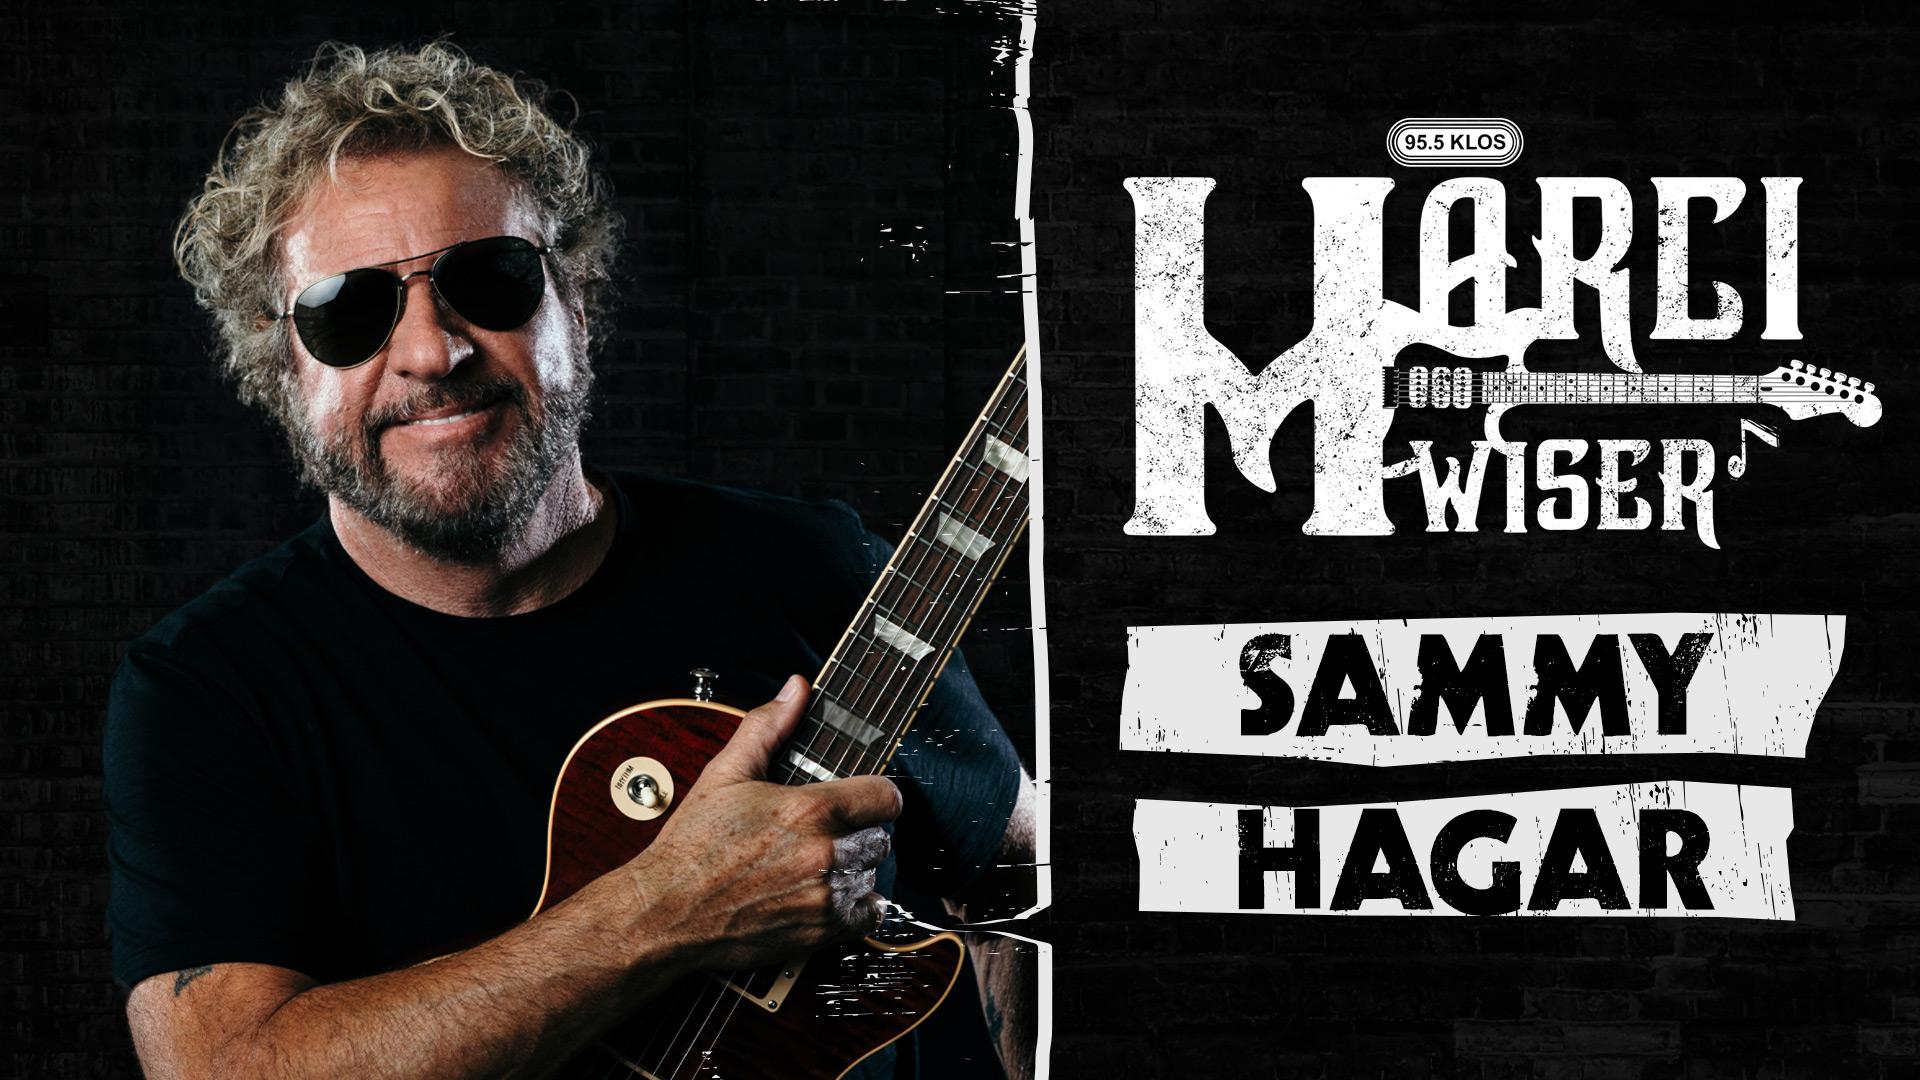 Sammy Hagar Talks Live Shows, Sammy Music, His Record Label Wanting Van Halen To Change Their Name & More!